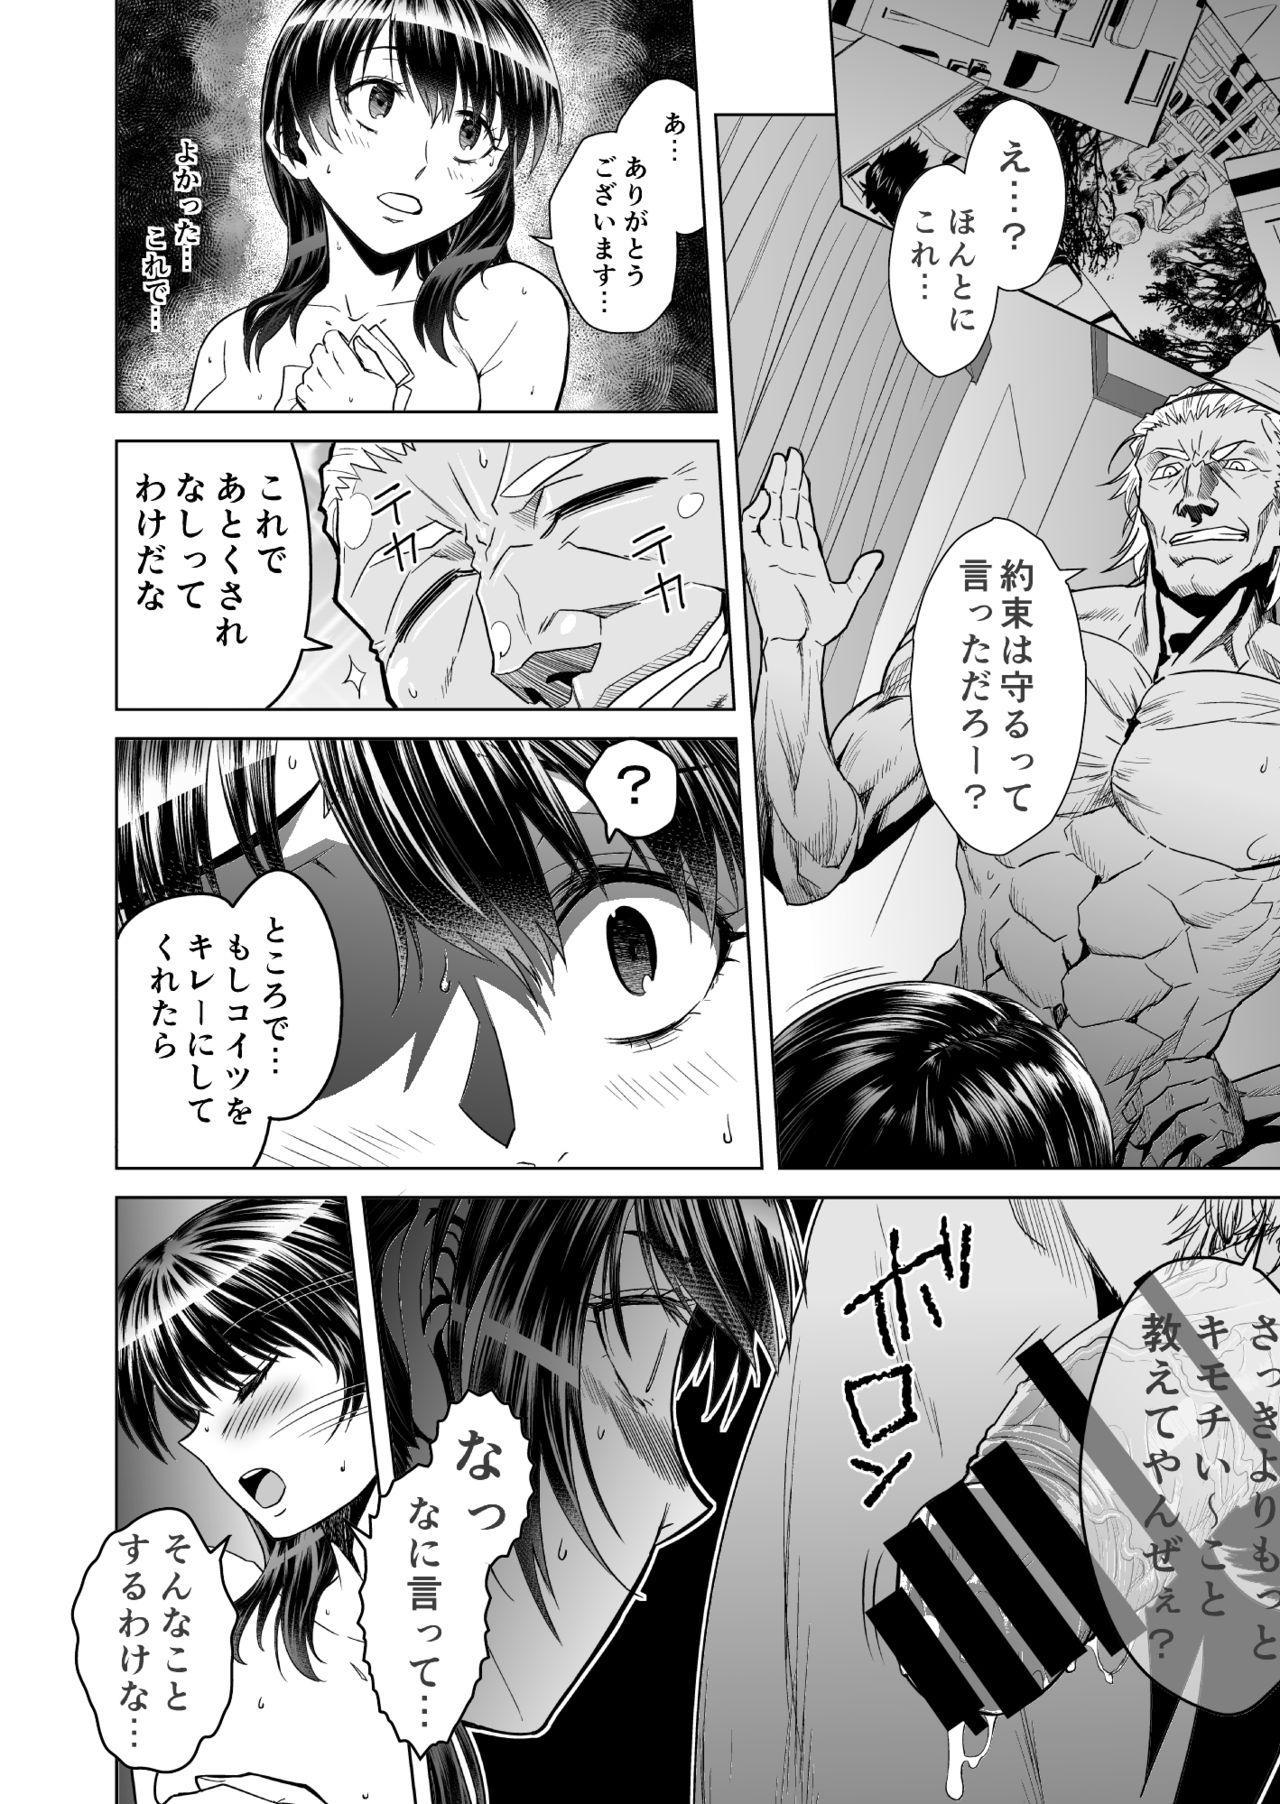 Akaneiro no Joukei 26